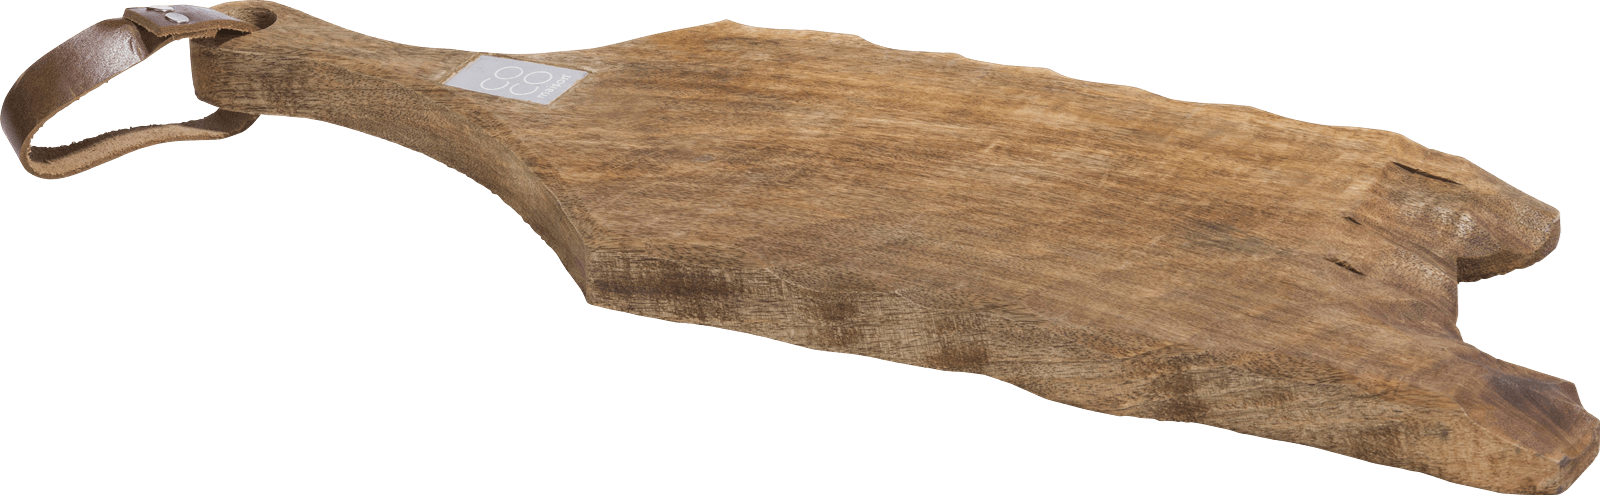 Coco Maison - snijplank manilla - 20 x 64 cm